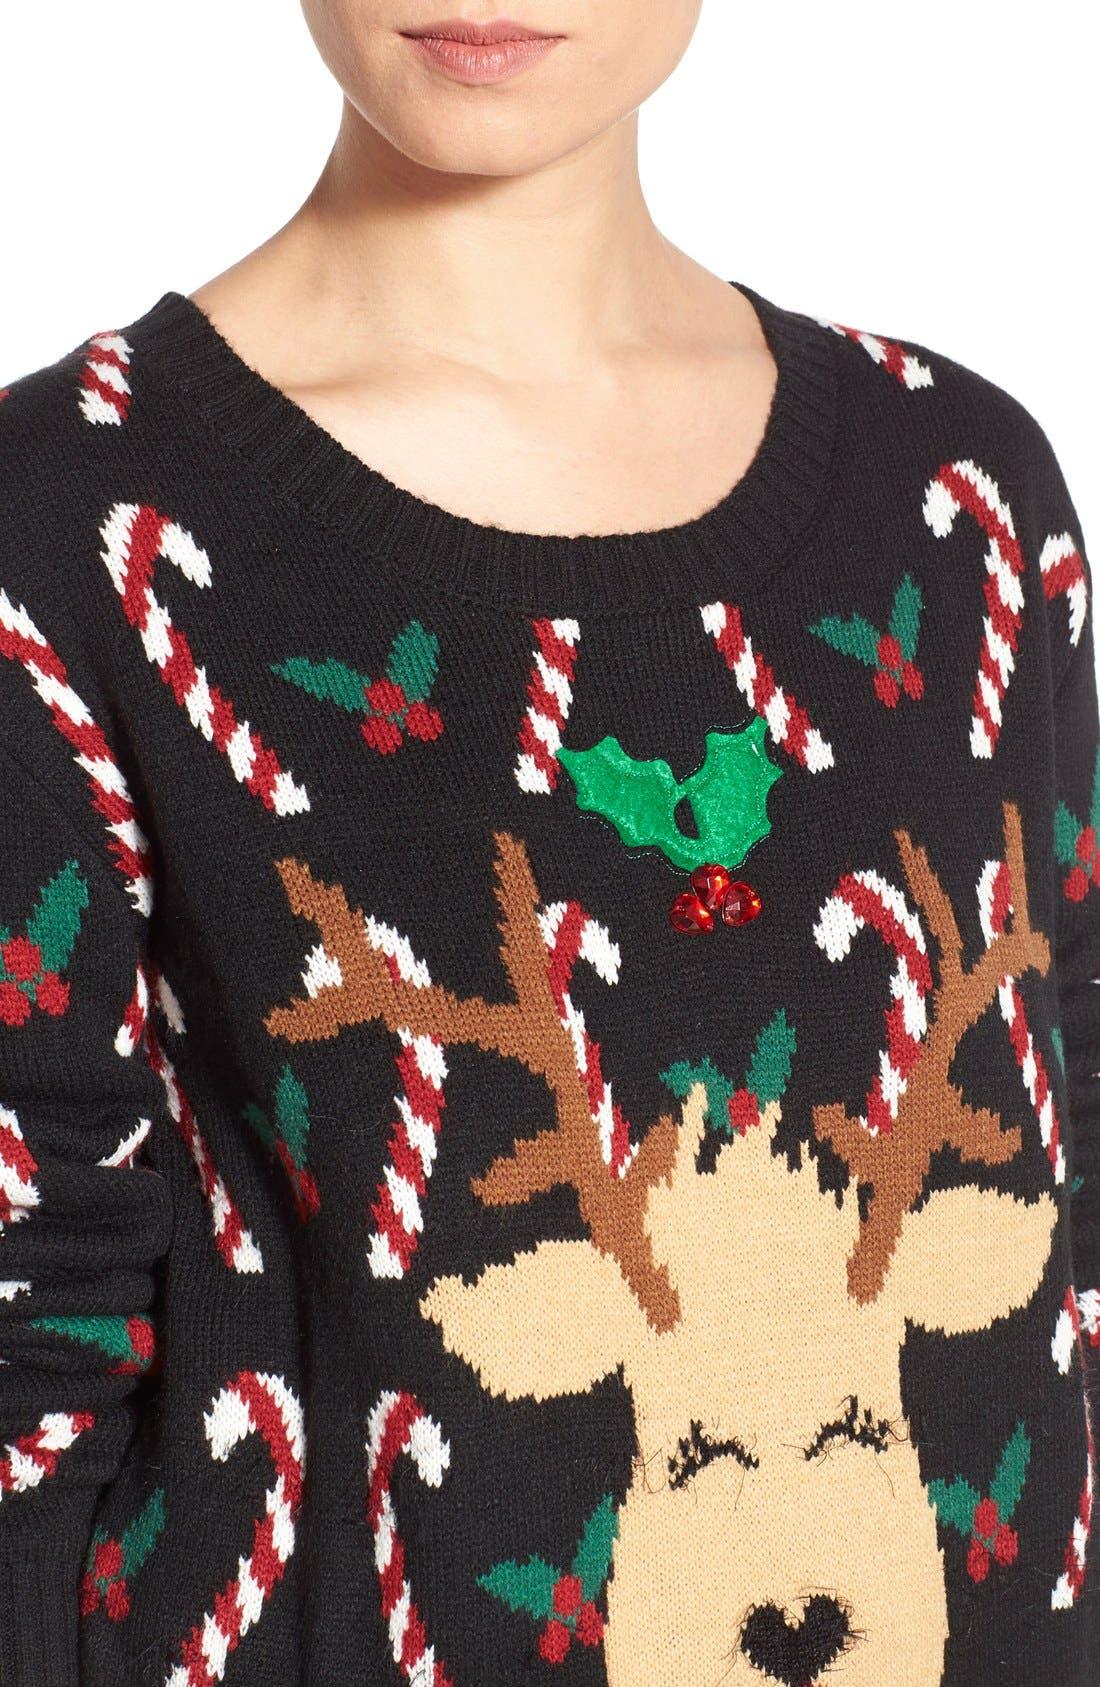 LOVE BY DESIGN,                             Mistletoe Reindeer Christmas Sweater,                             Alternate thumbnail 2, color,                             016